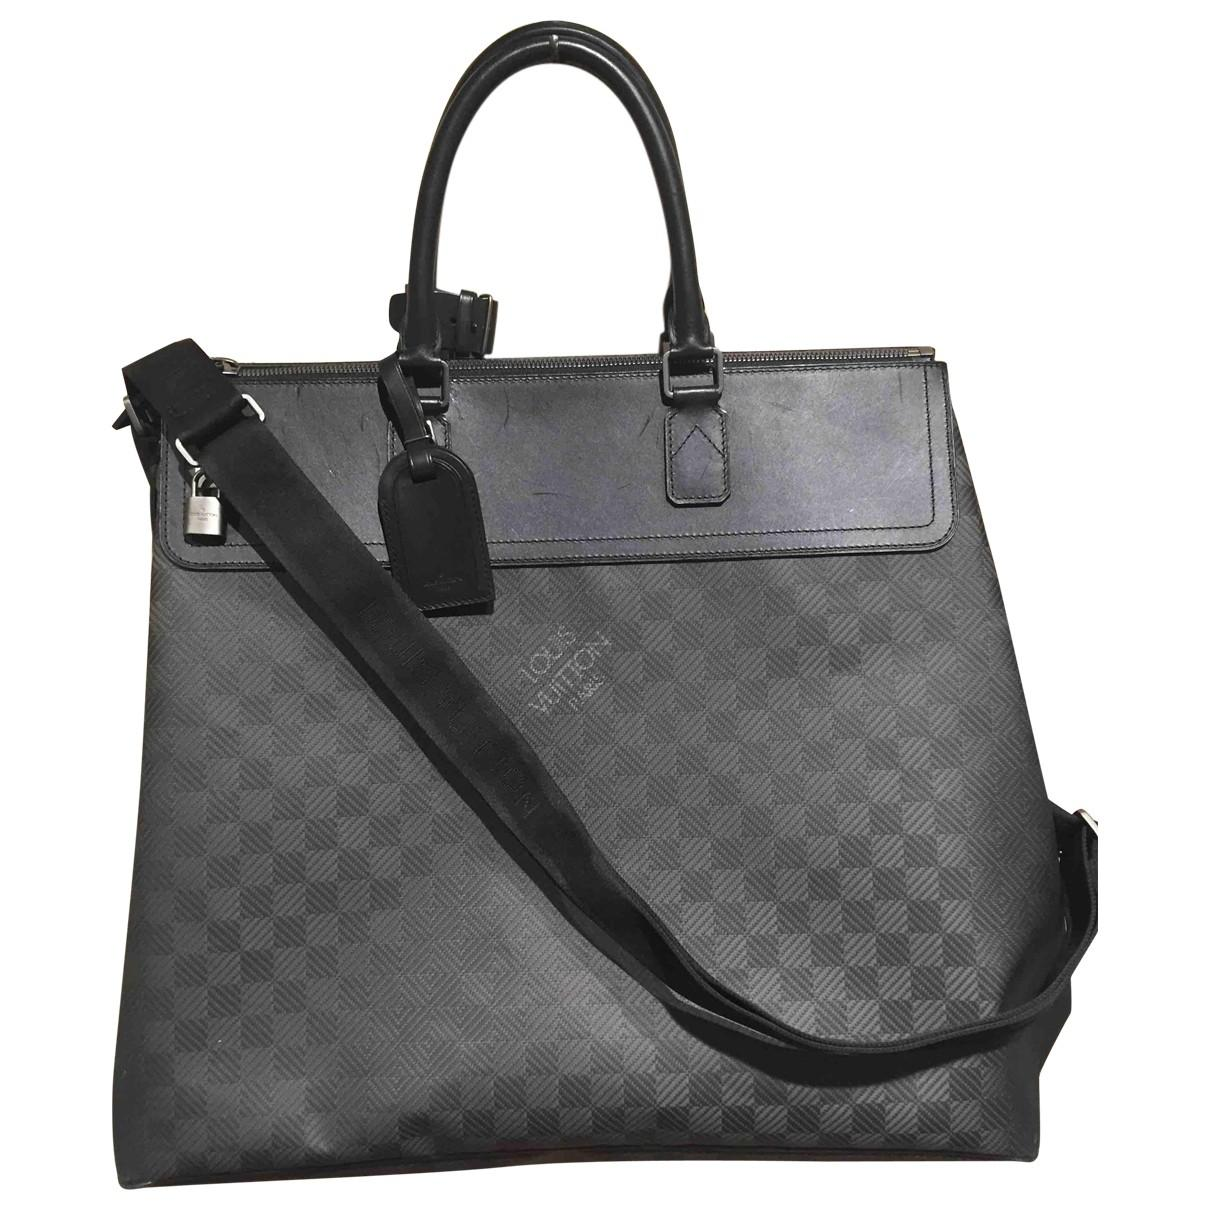 c3a1da50a899 Louis Vuitton Black Cloth Bag in Black for Men - Lyst